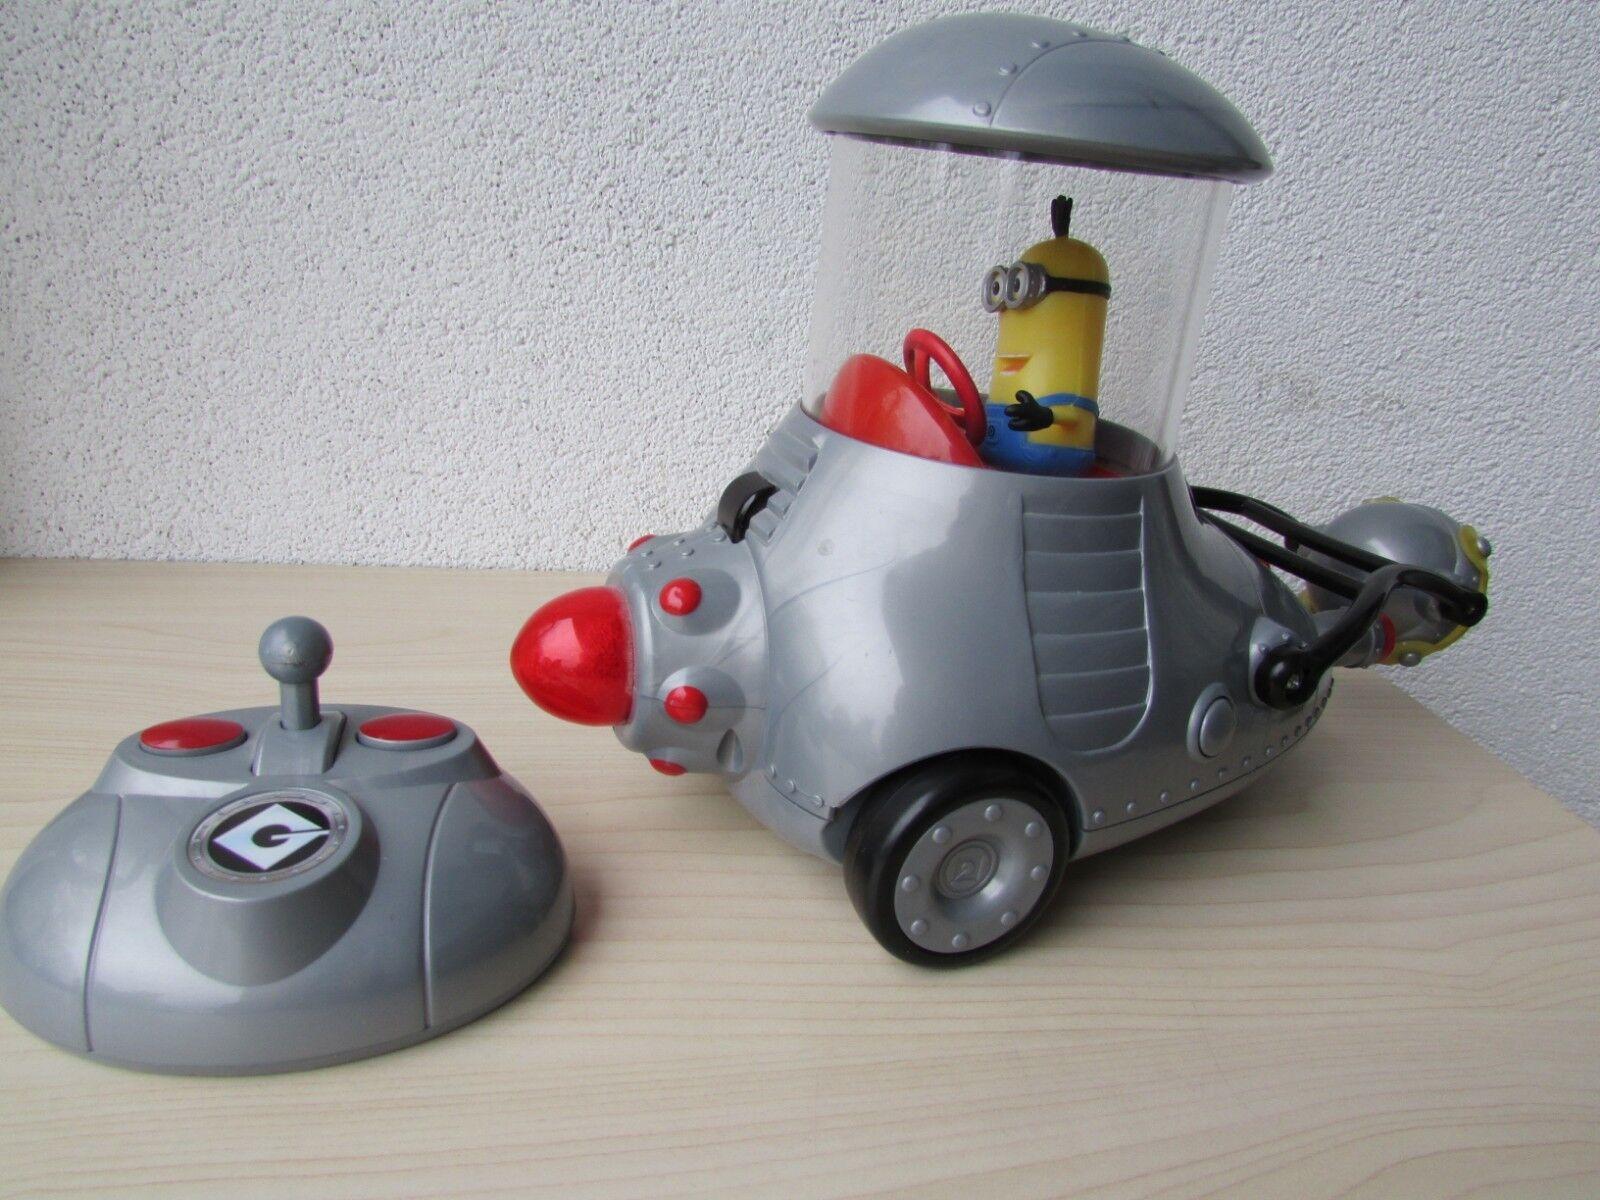 Despicable Me 2 Remote Control Minion Mobile Thinkway Toys DM2 RC Car (V.G.C.)